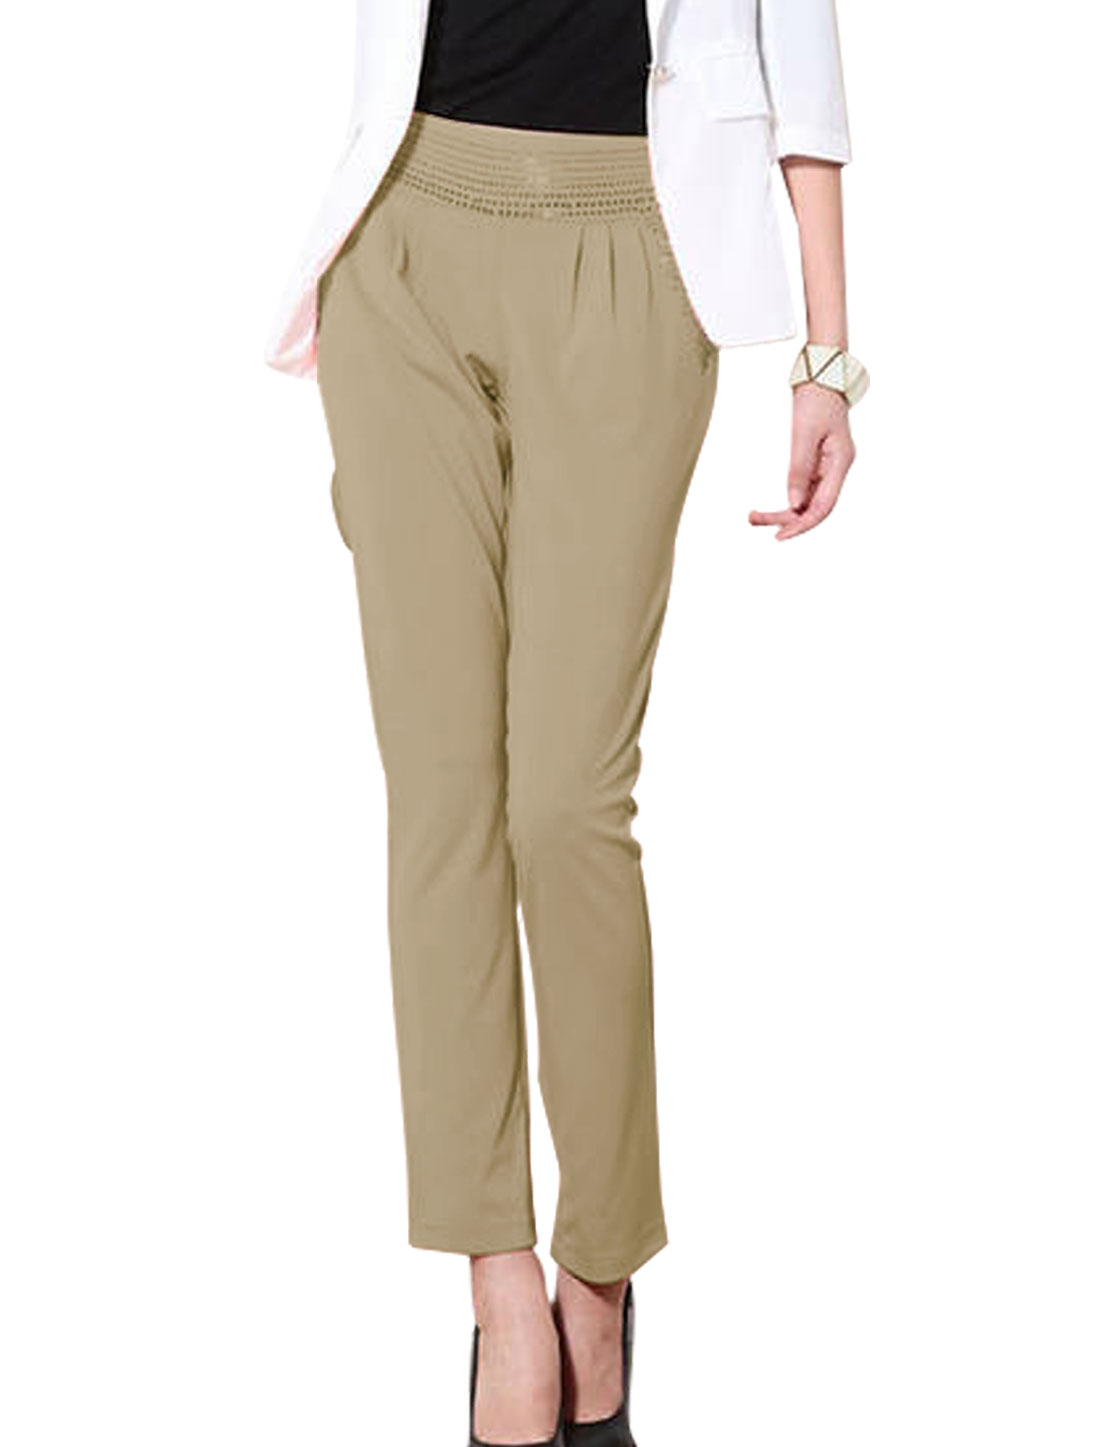 Women Fake Welt Pockets Back Rhinestone Decor Soft Pants Dark Khaki S